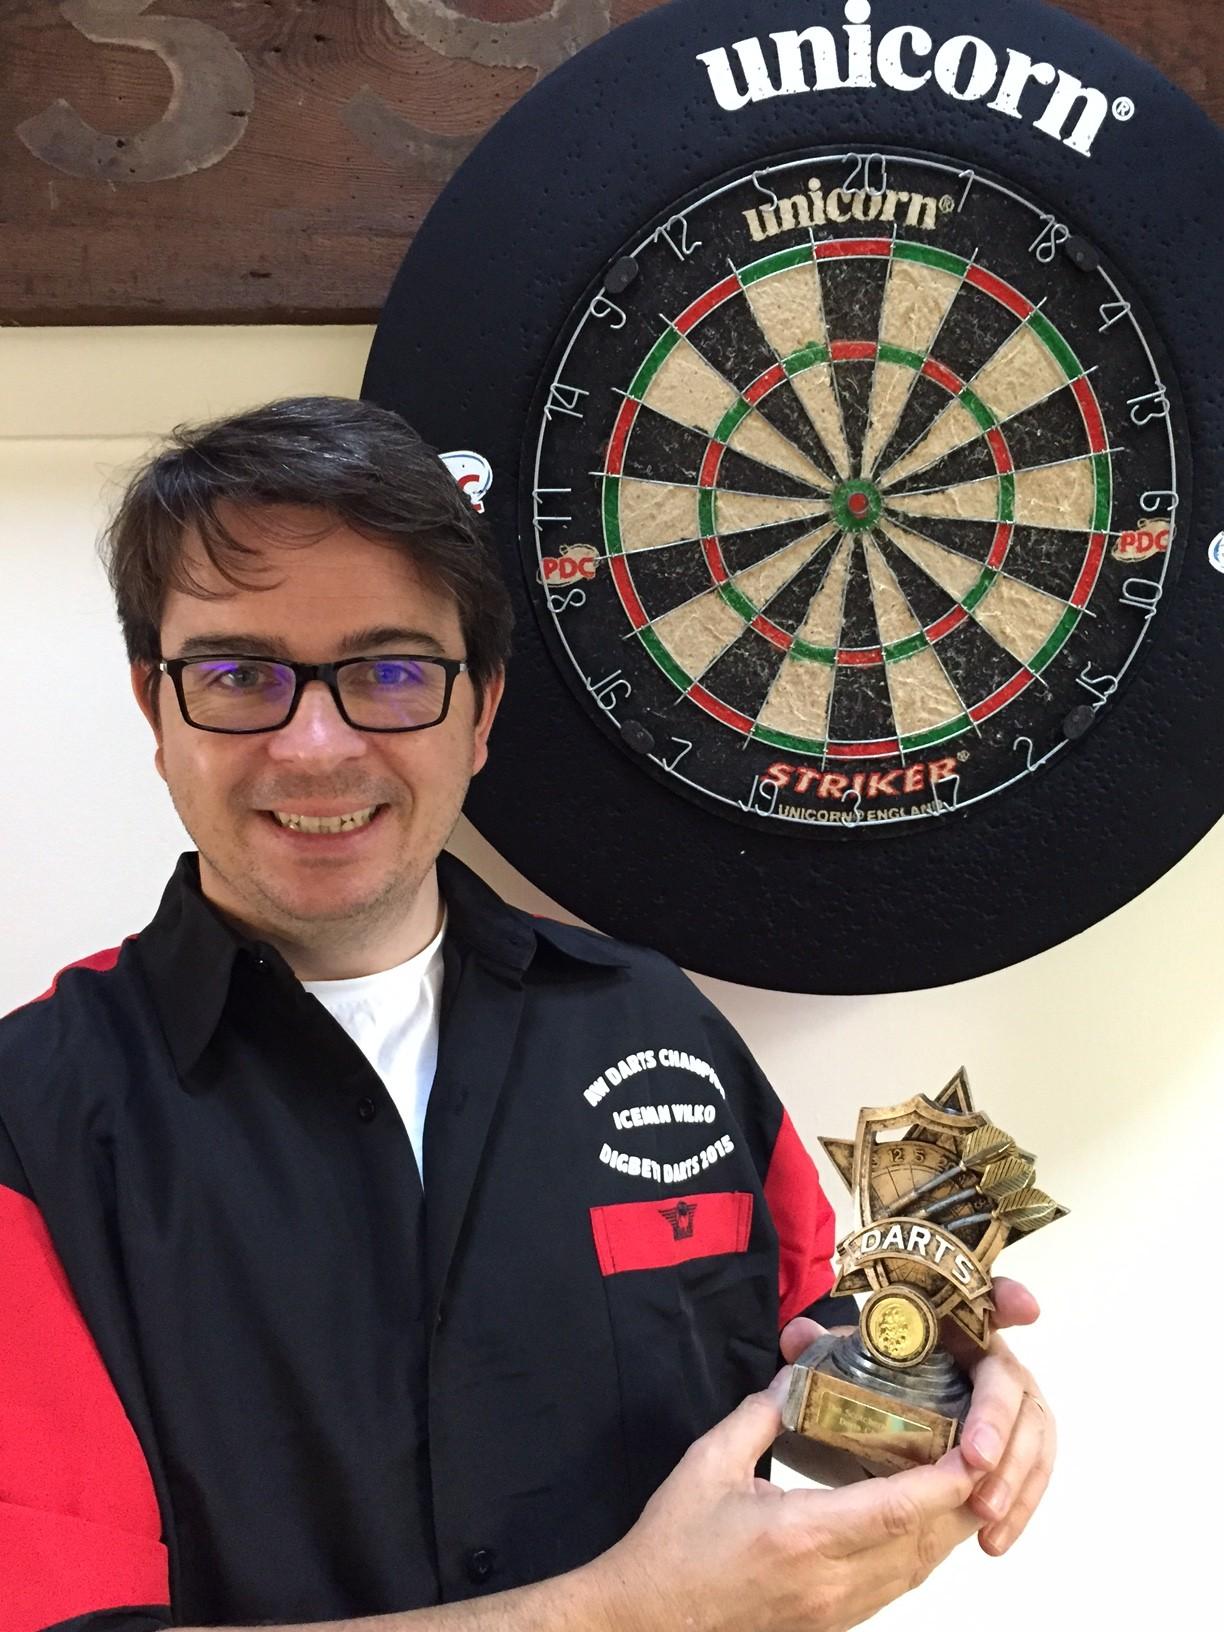 Iceman Wilkinson sends big freeze over Digbeth Darts Championship